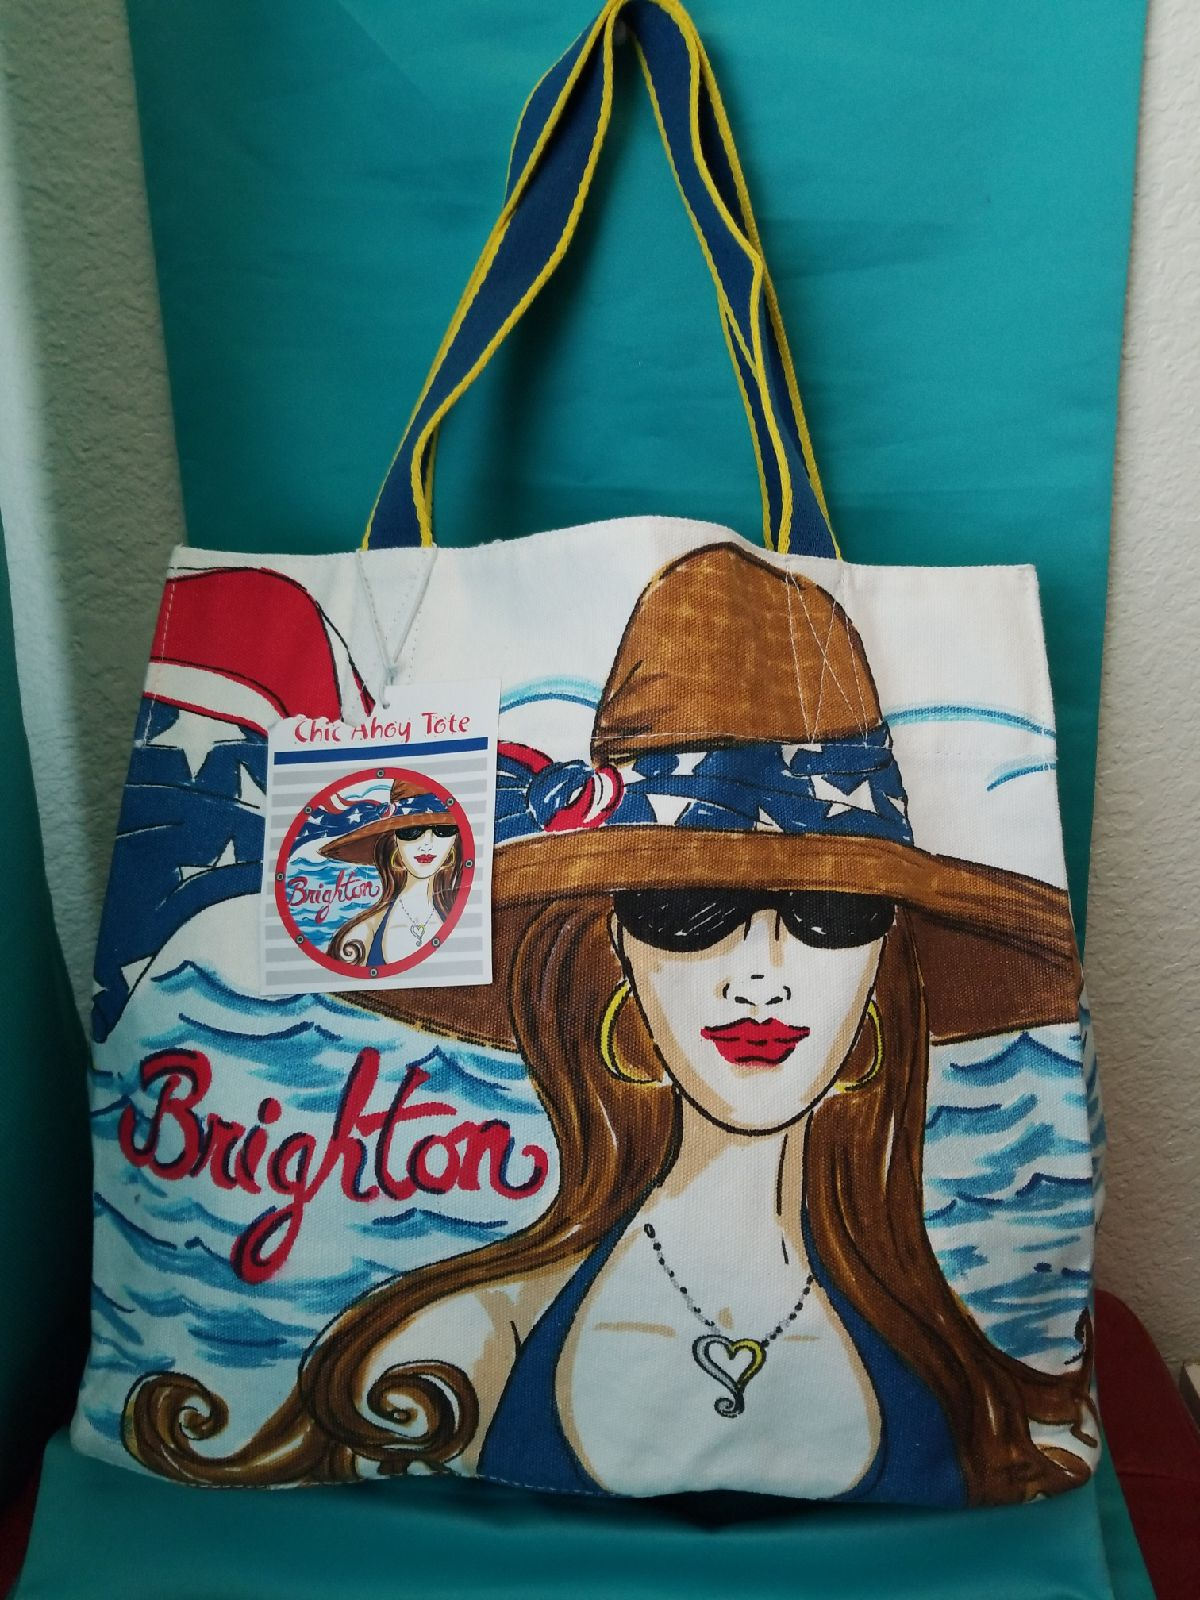 Brighton Chic Ahoy Beach Tote Canvas